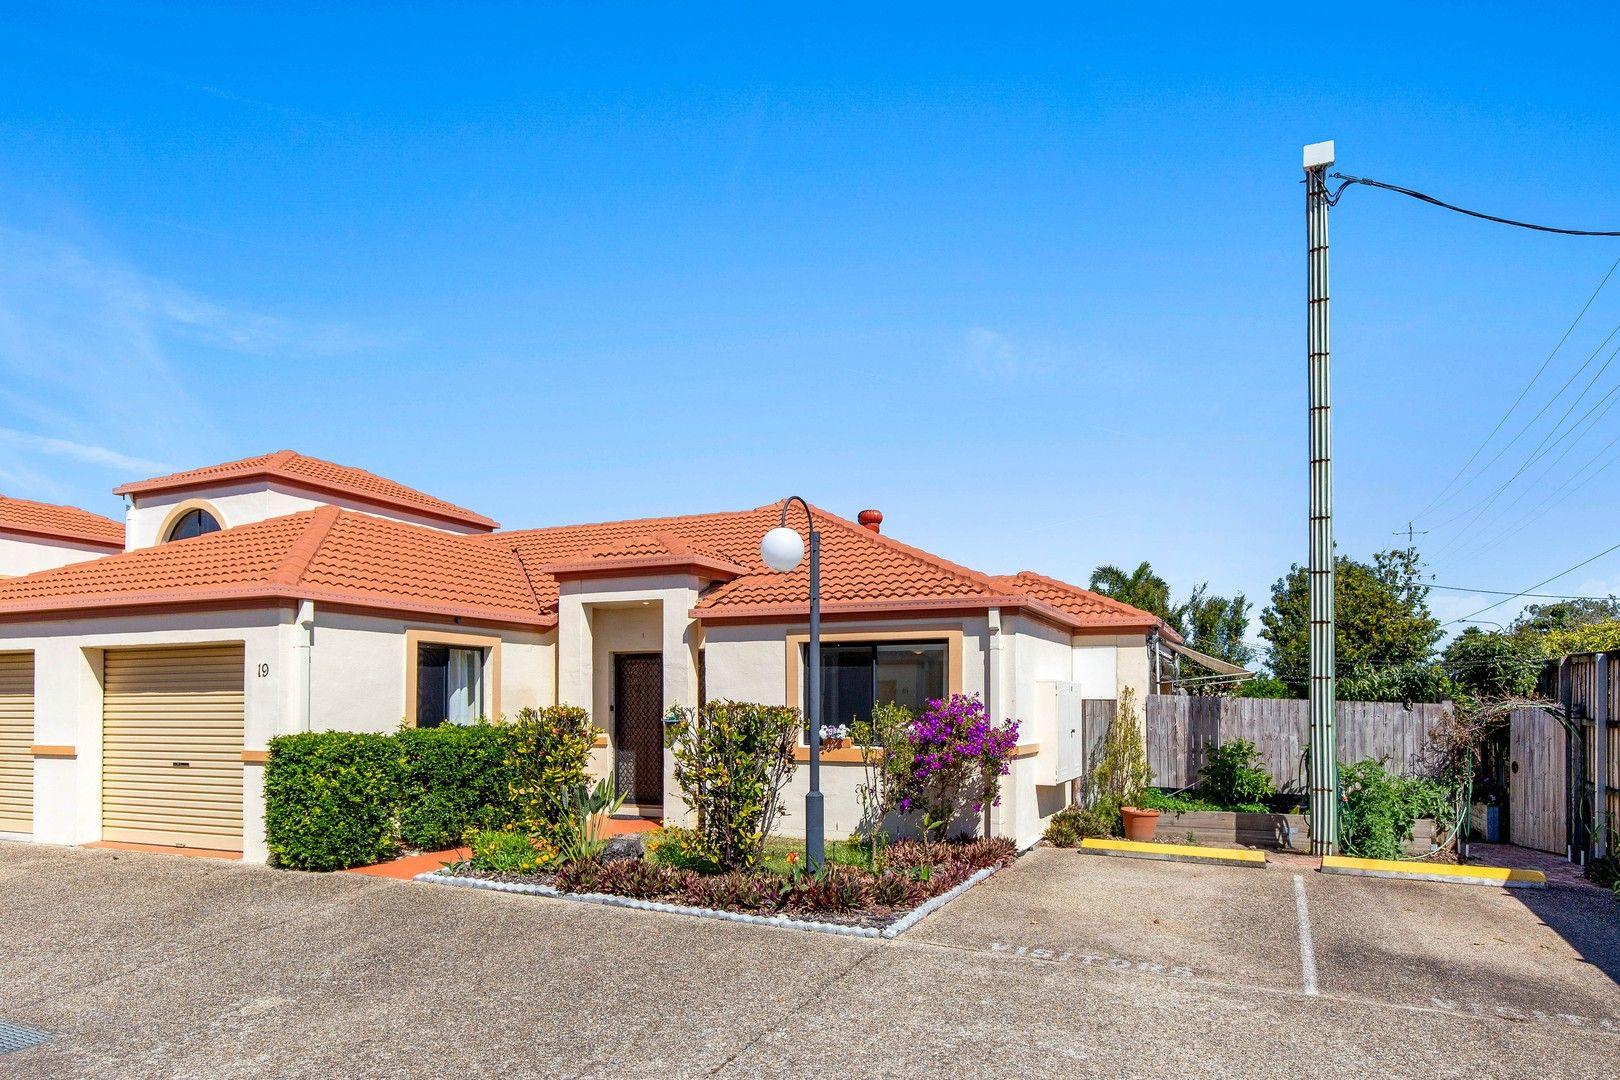 19/74 Plaza Street, Wynnum West QLD 4178, Image 0